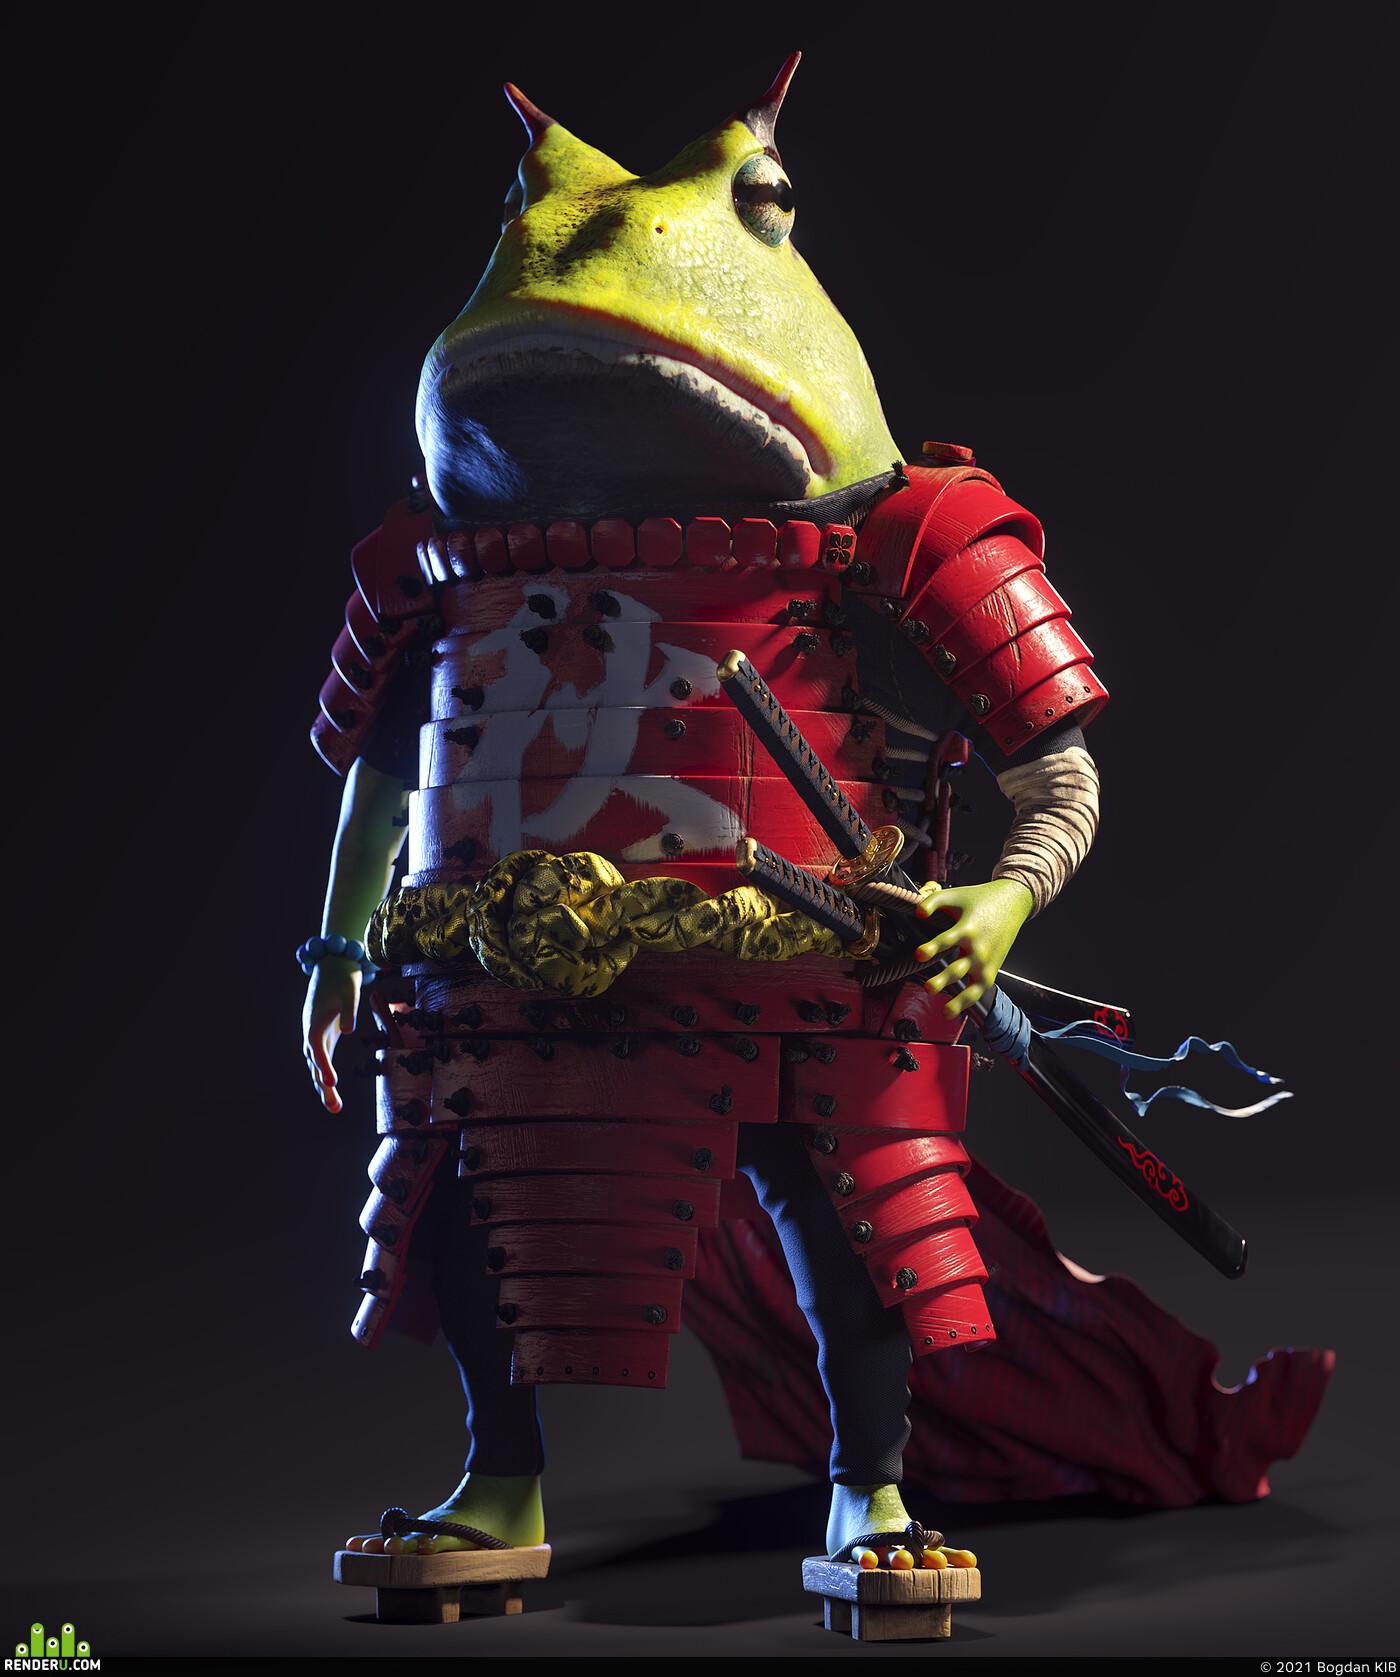 жаба, самурай, Катана, доспехи, персонаж